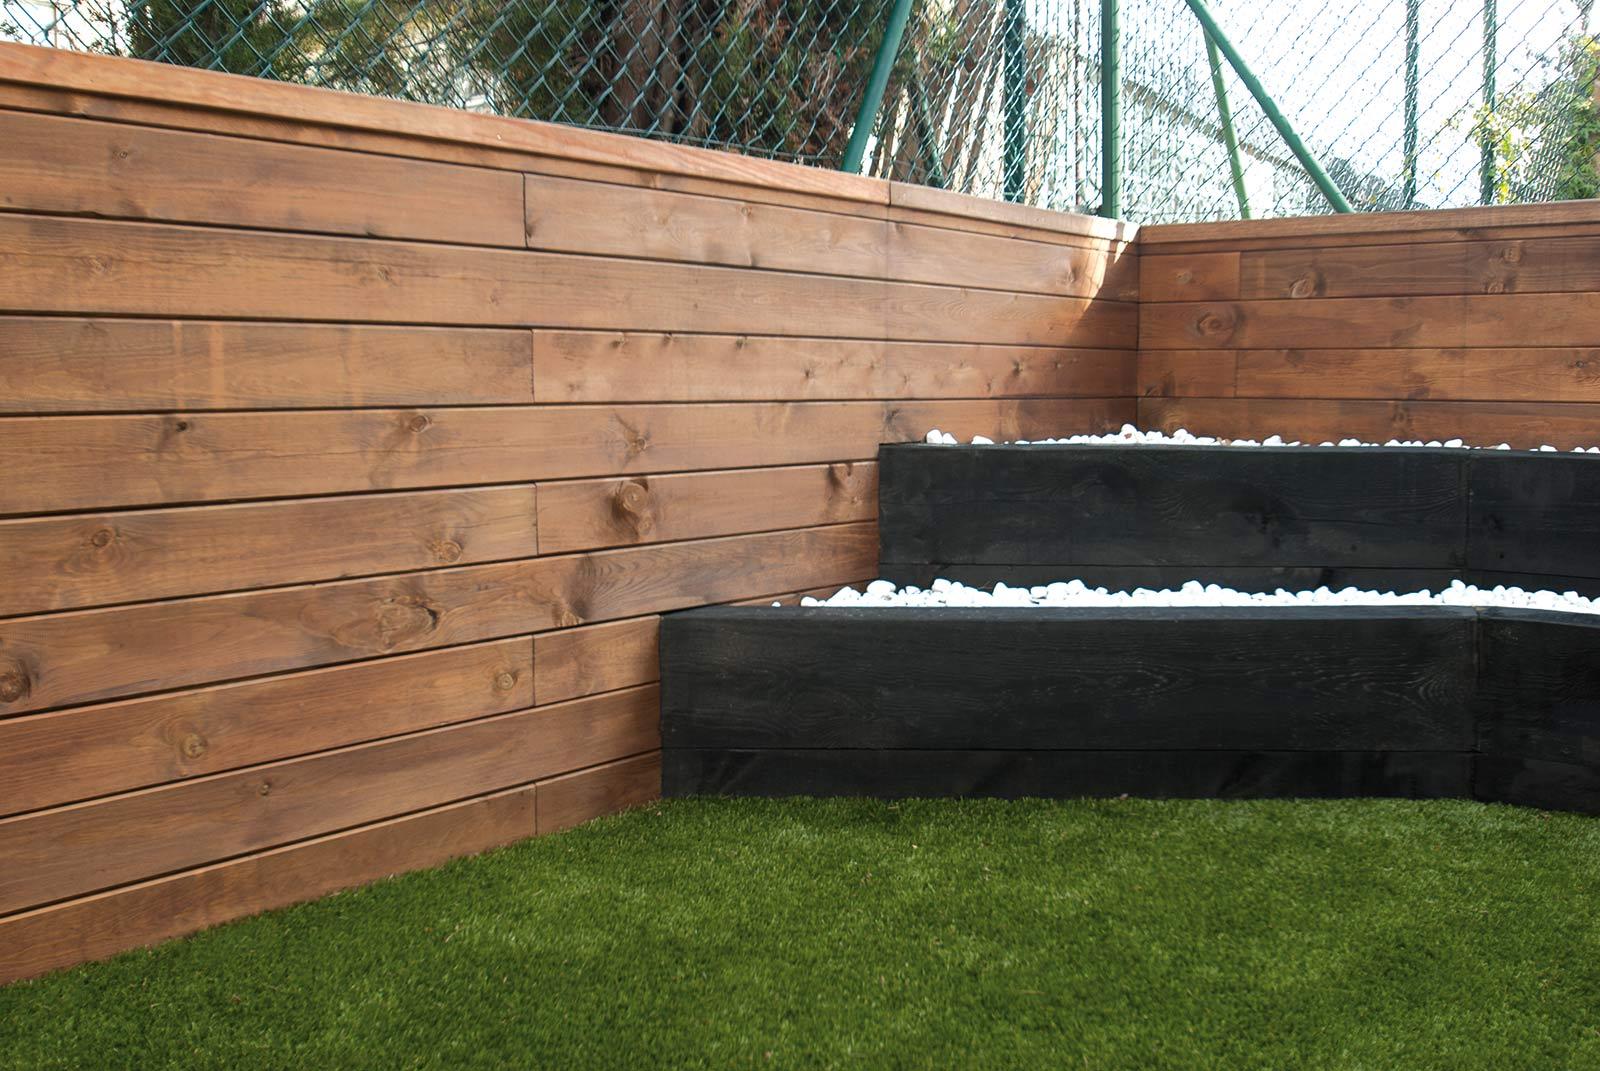 jardin-cespe-artificial-tarima-traviesas-5